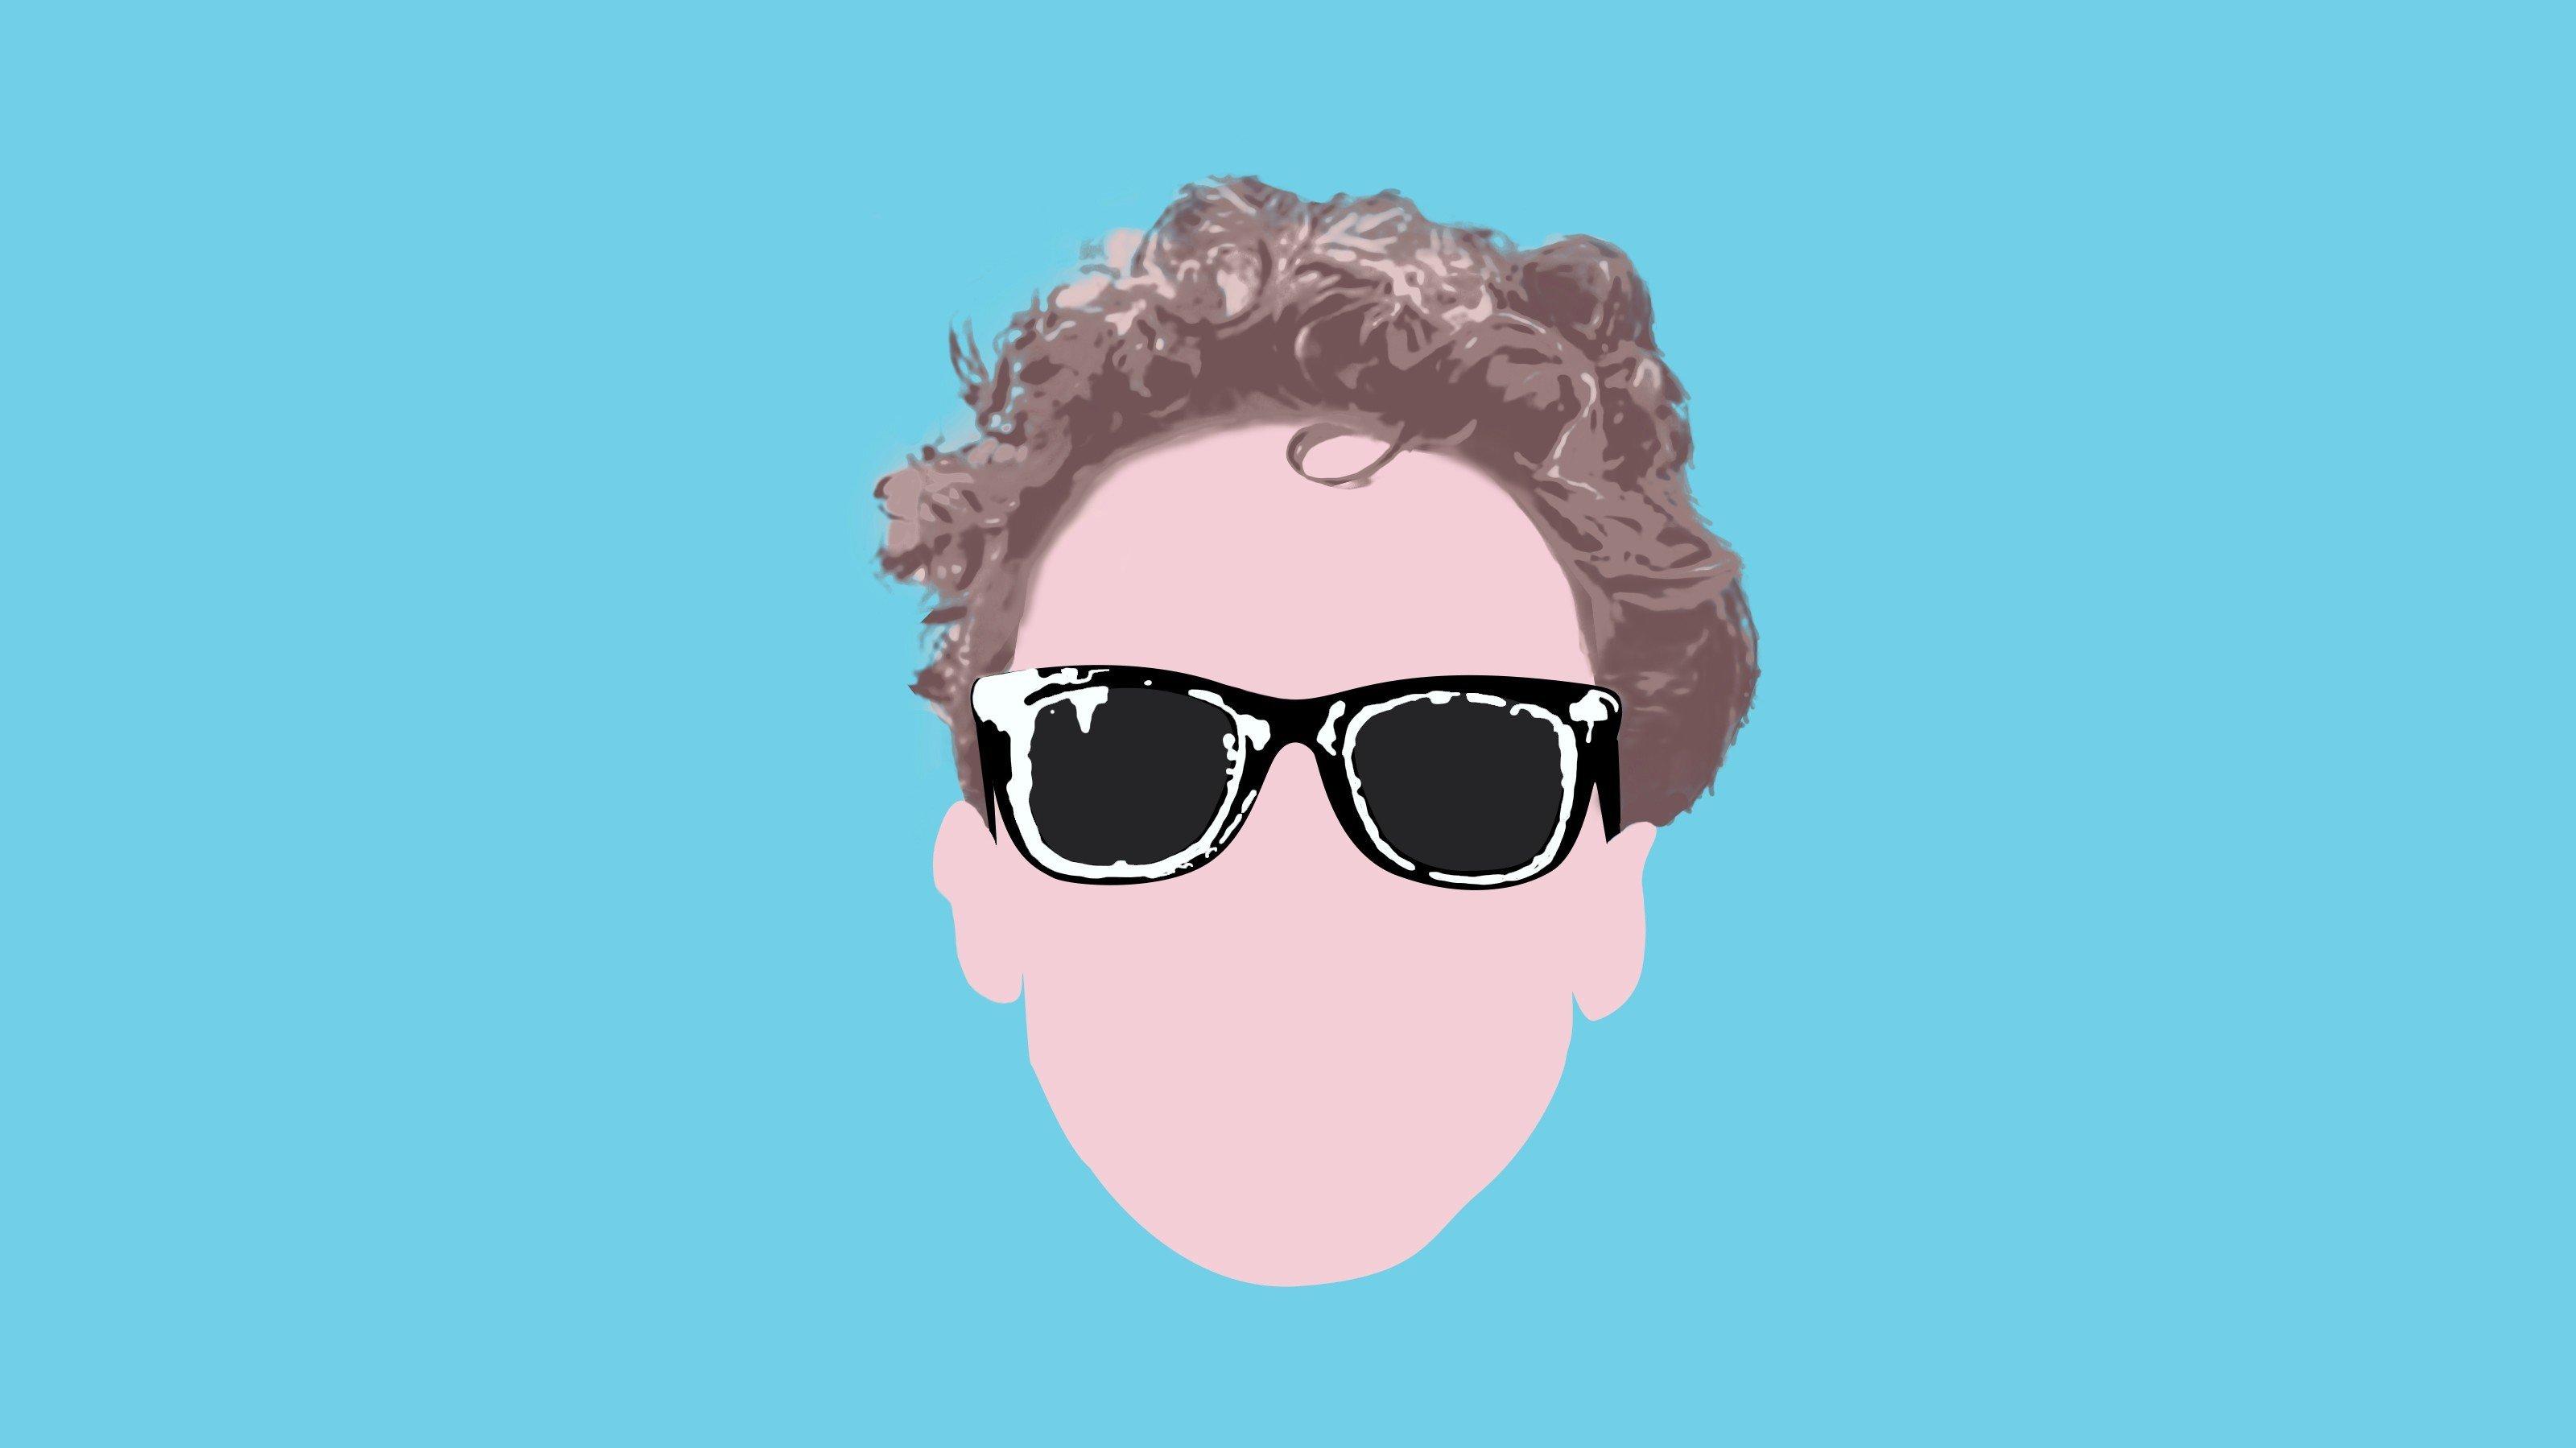 190c6fed3a8 3200x1799 px Casey Neistat glasses motivational